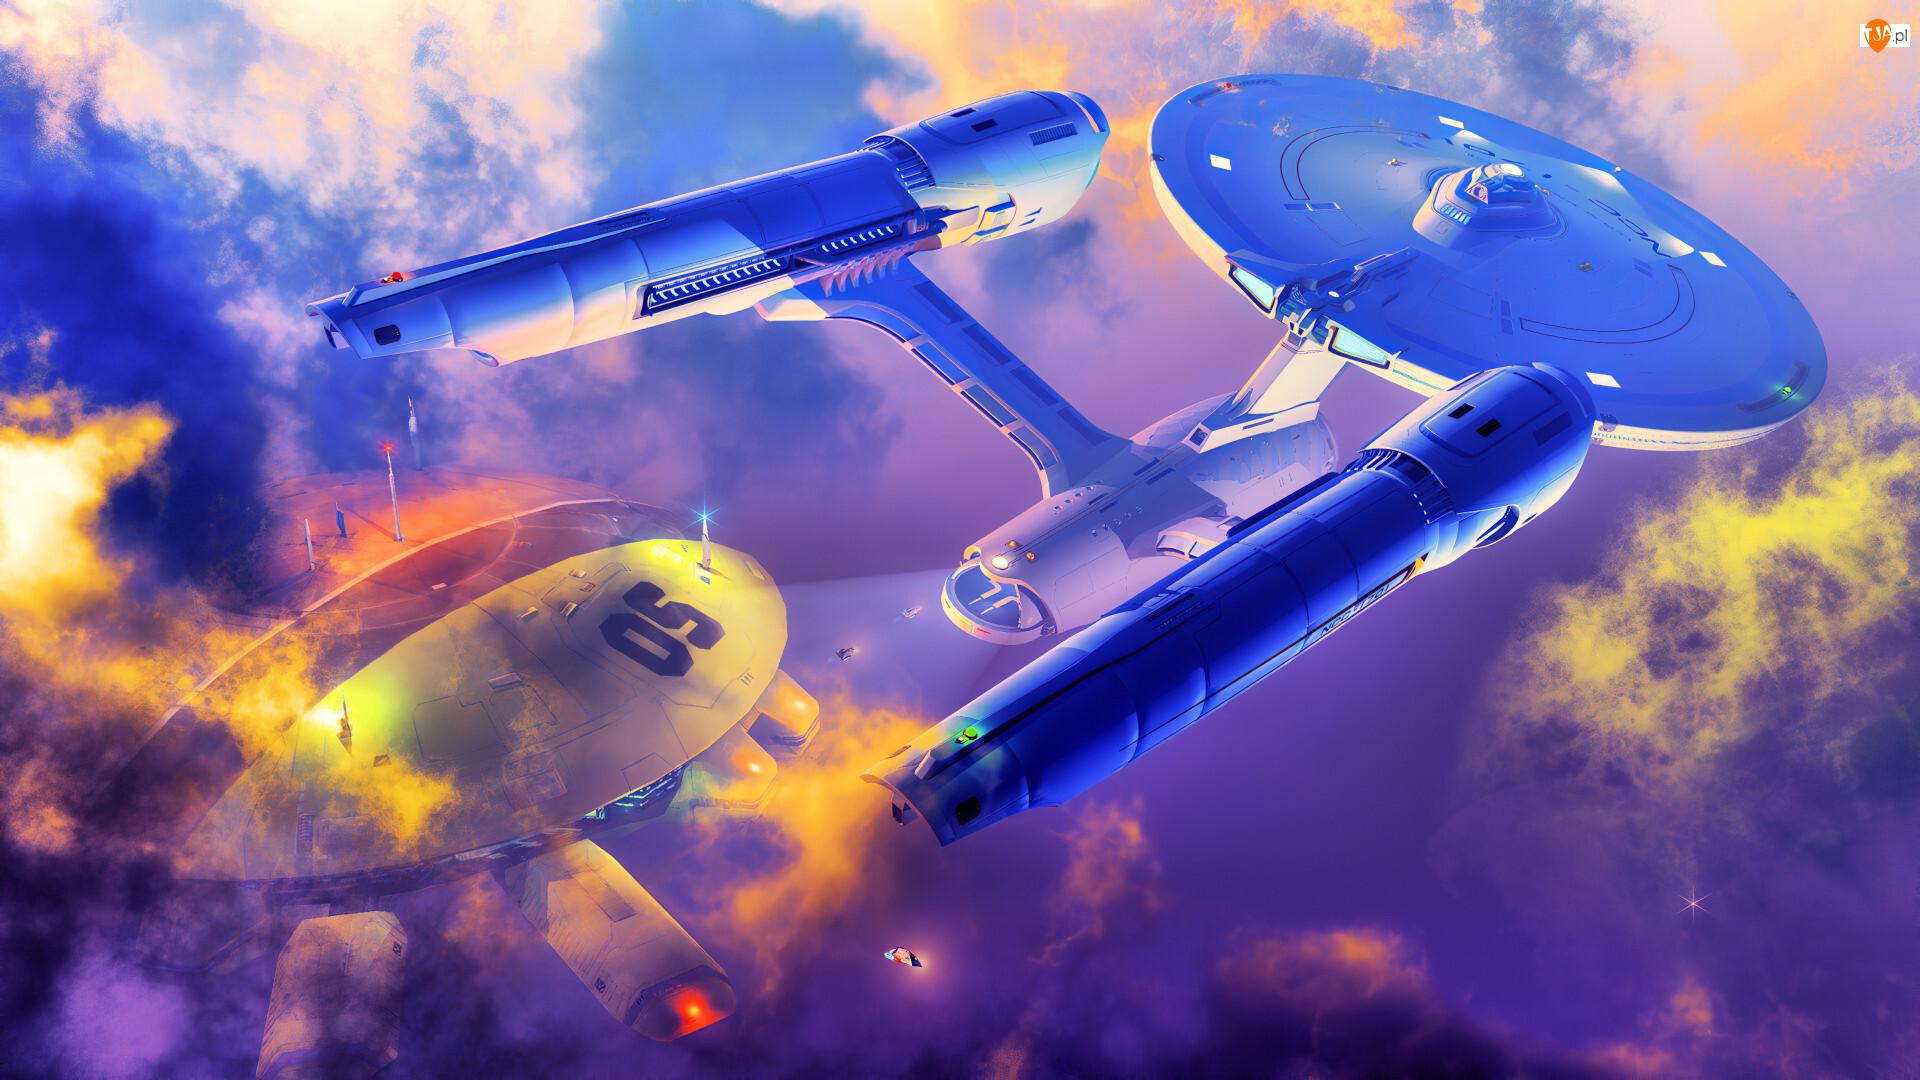 Grafika, Enterprise, Statki kosmiczne